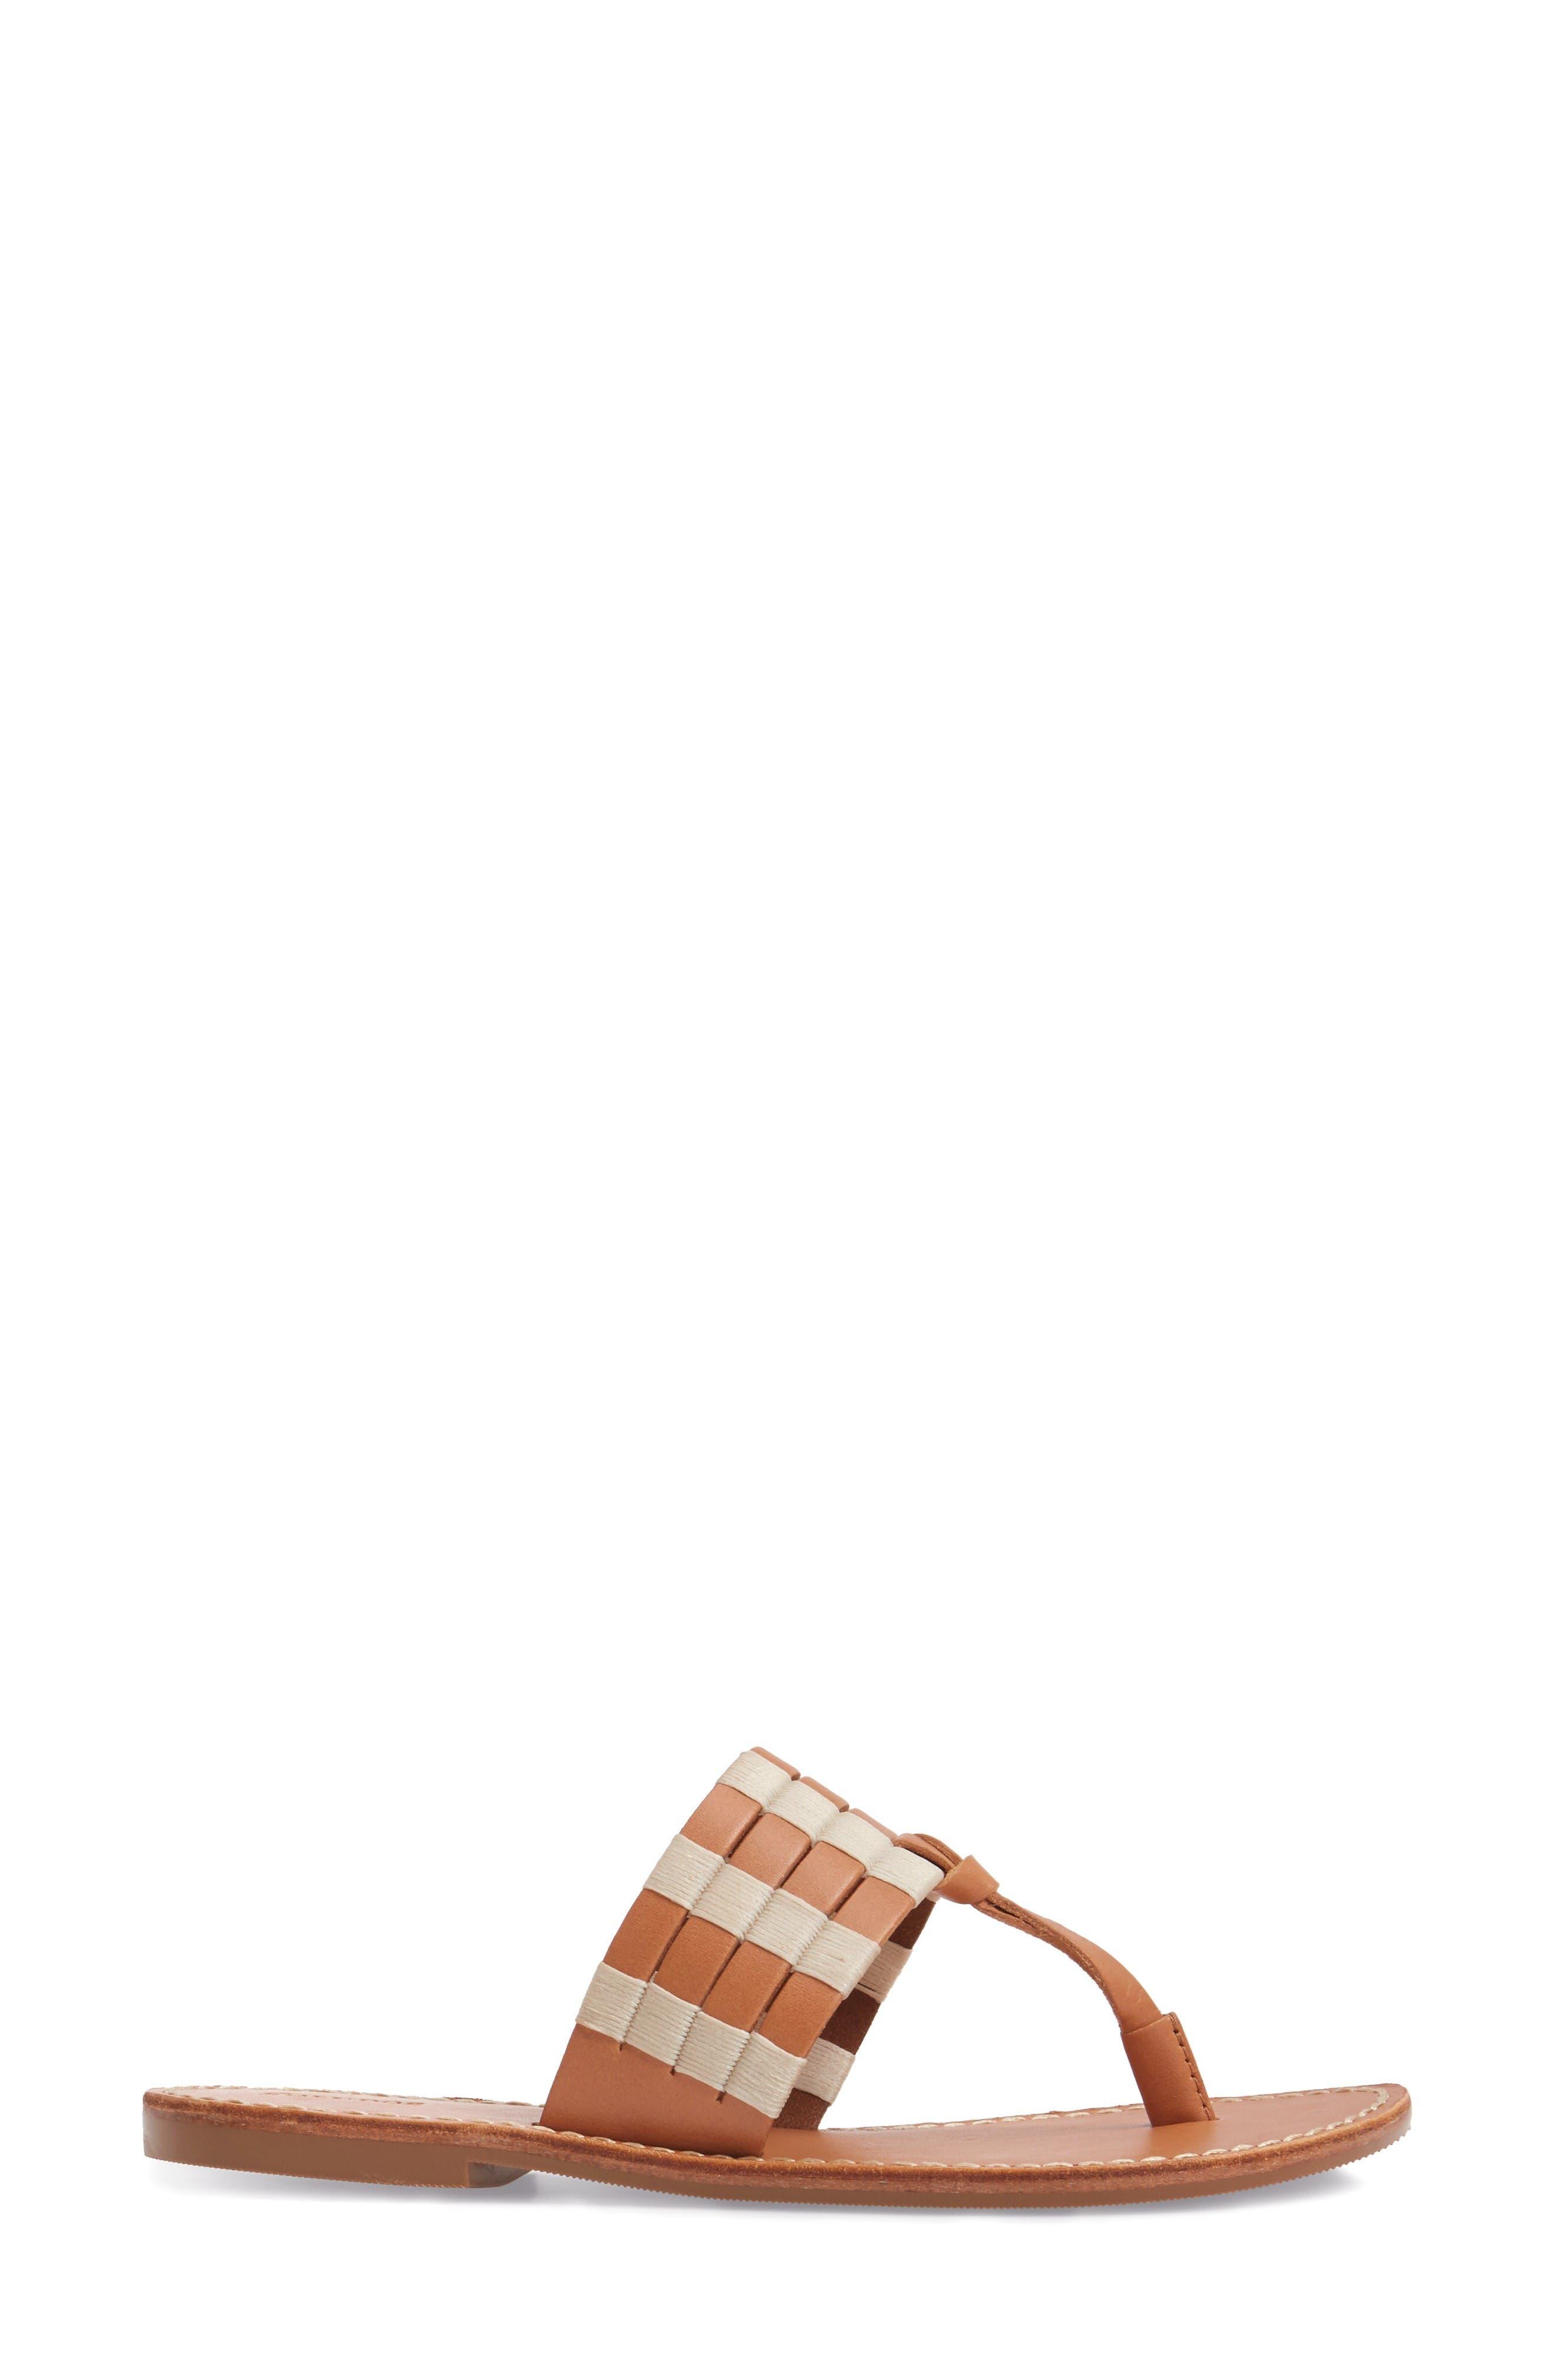 Alternate Image 3  - Soludos Sandal (Women)